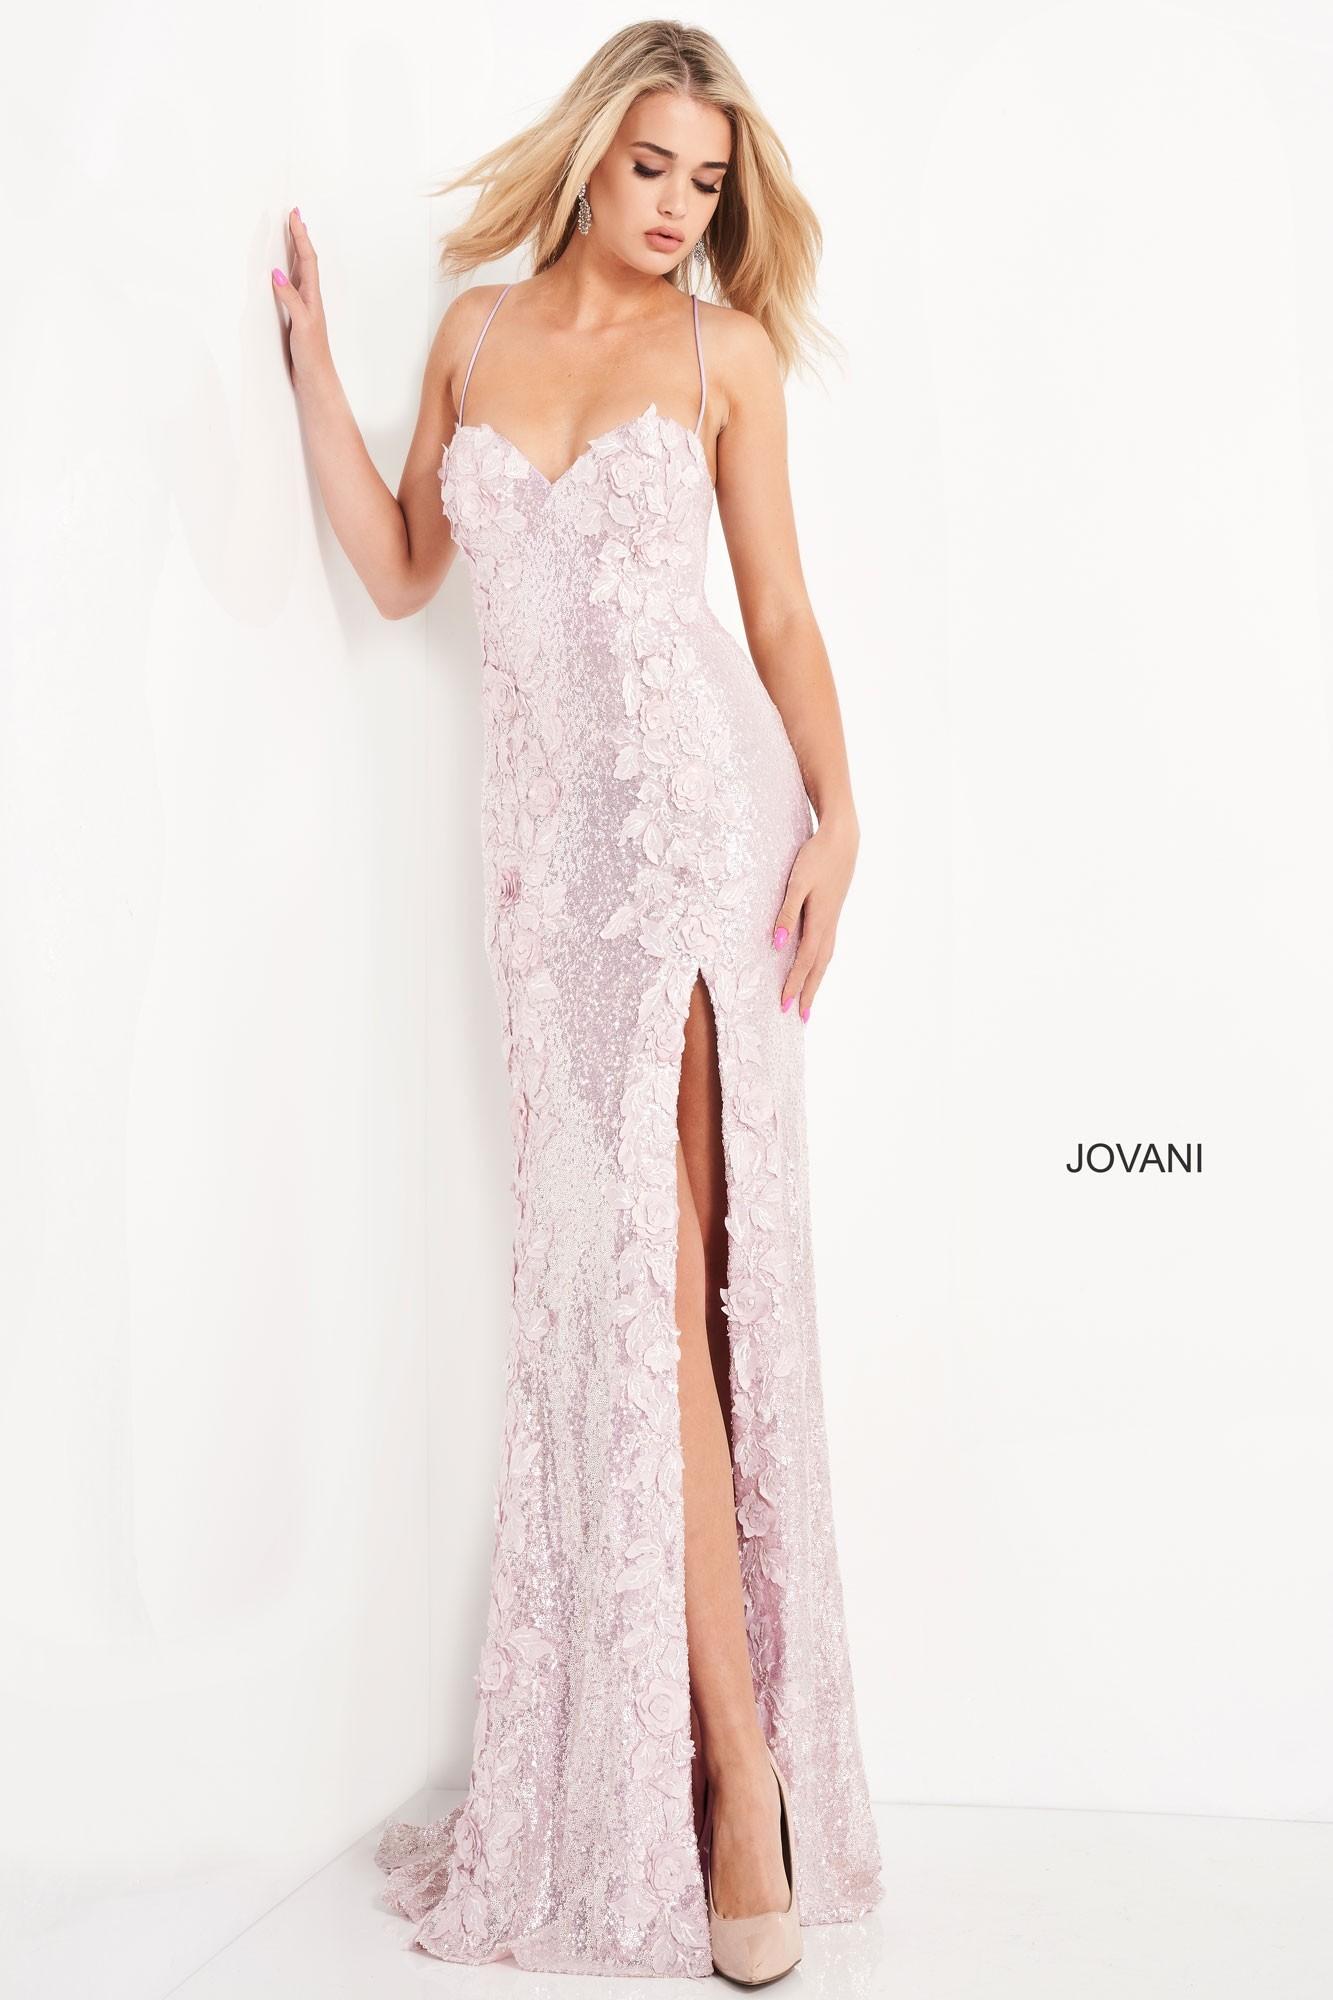 Jovani 06109 Sequin Floral Prom Dress